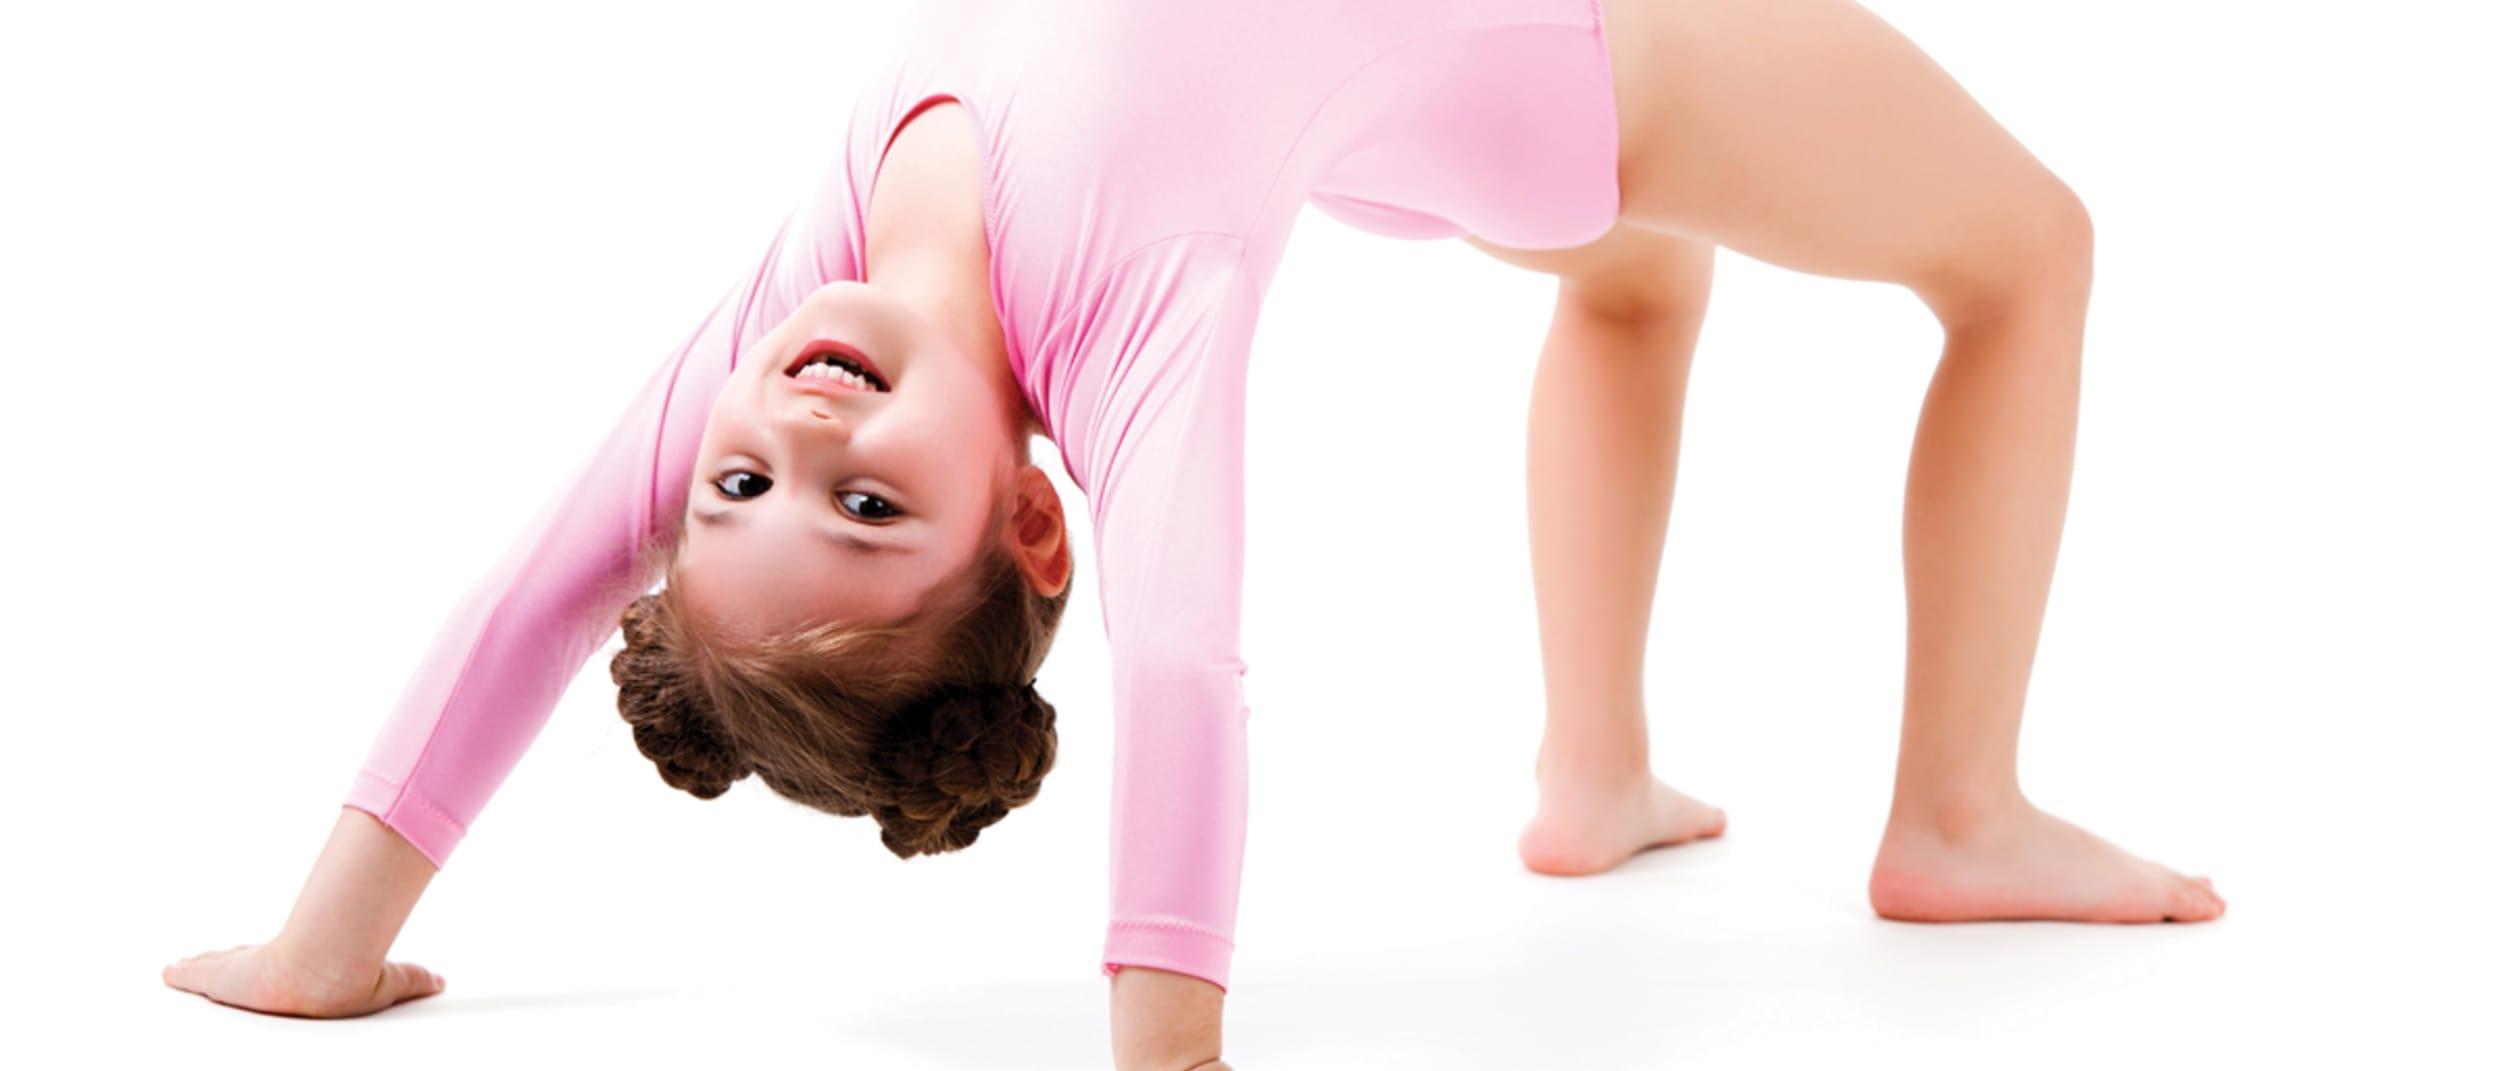 YMCA kids cheerleading and gymnastics workshops